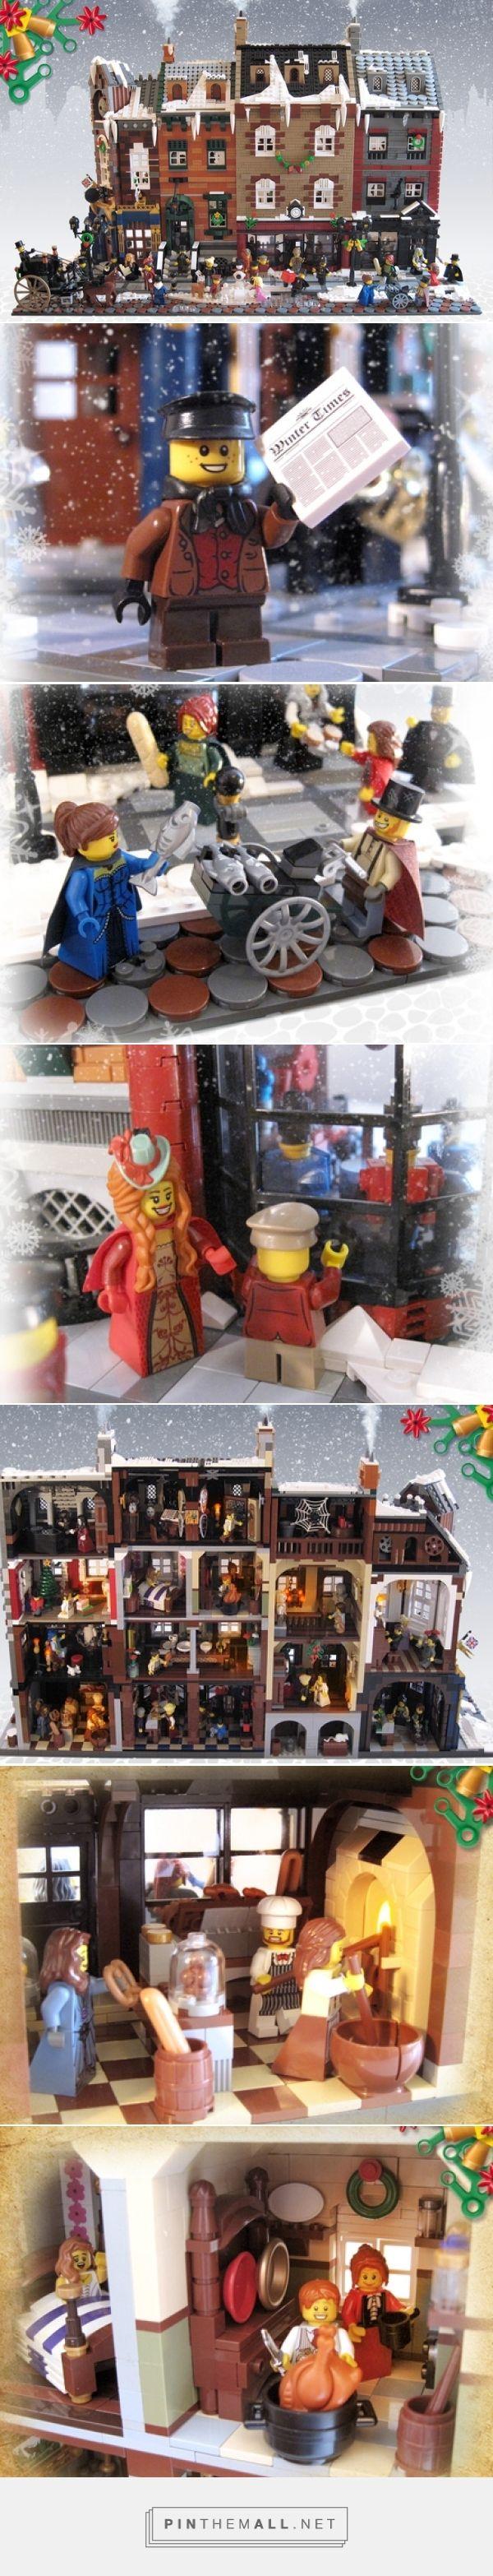 LEGO Ideas -      Victorian London Christmas - created via http://pinthemall.net